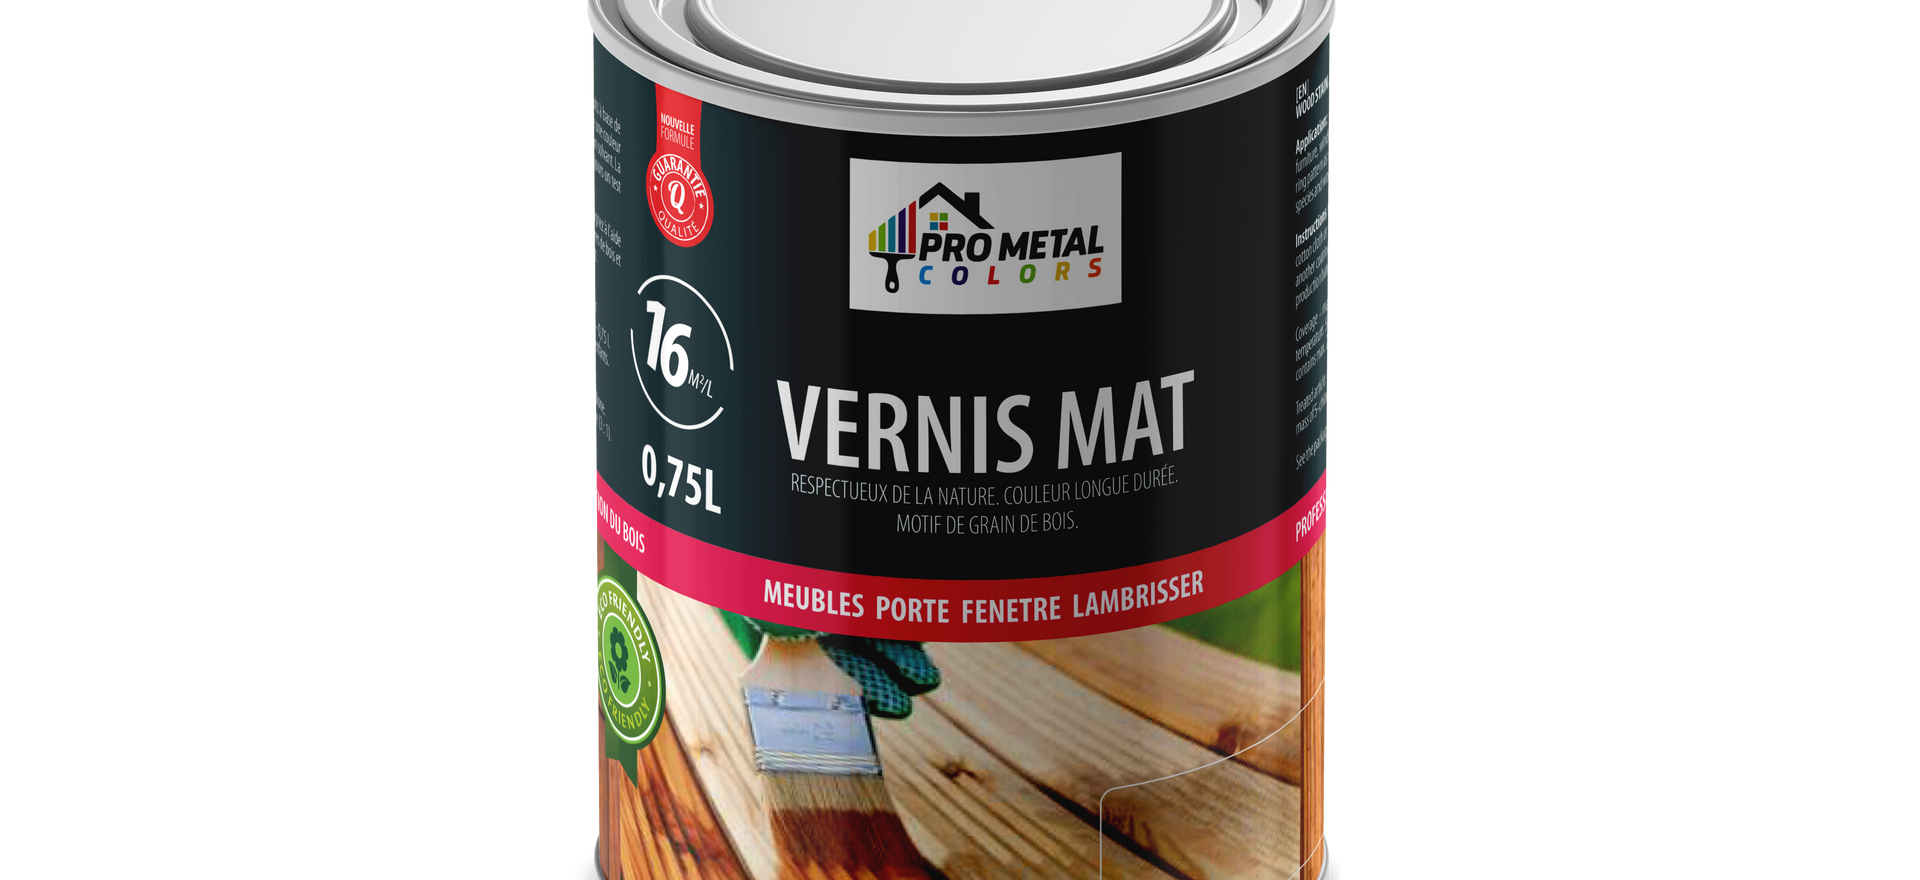 Vernis Mat 0.75 Litre 5€